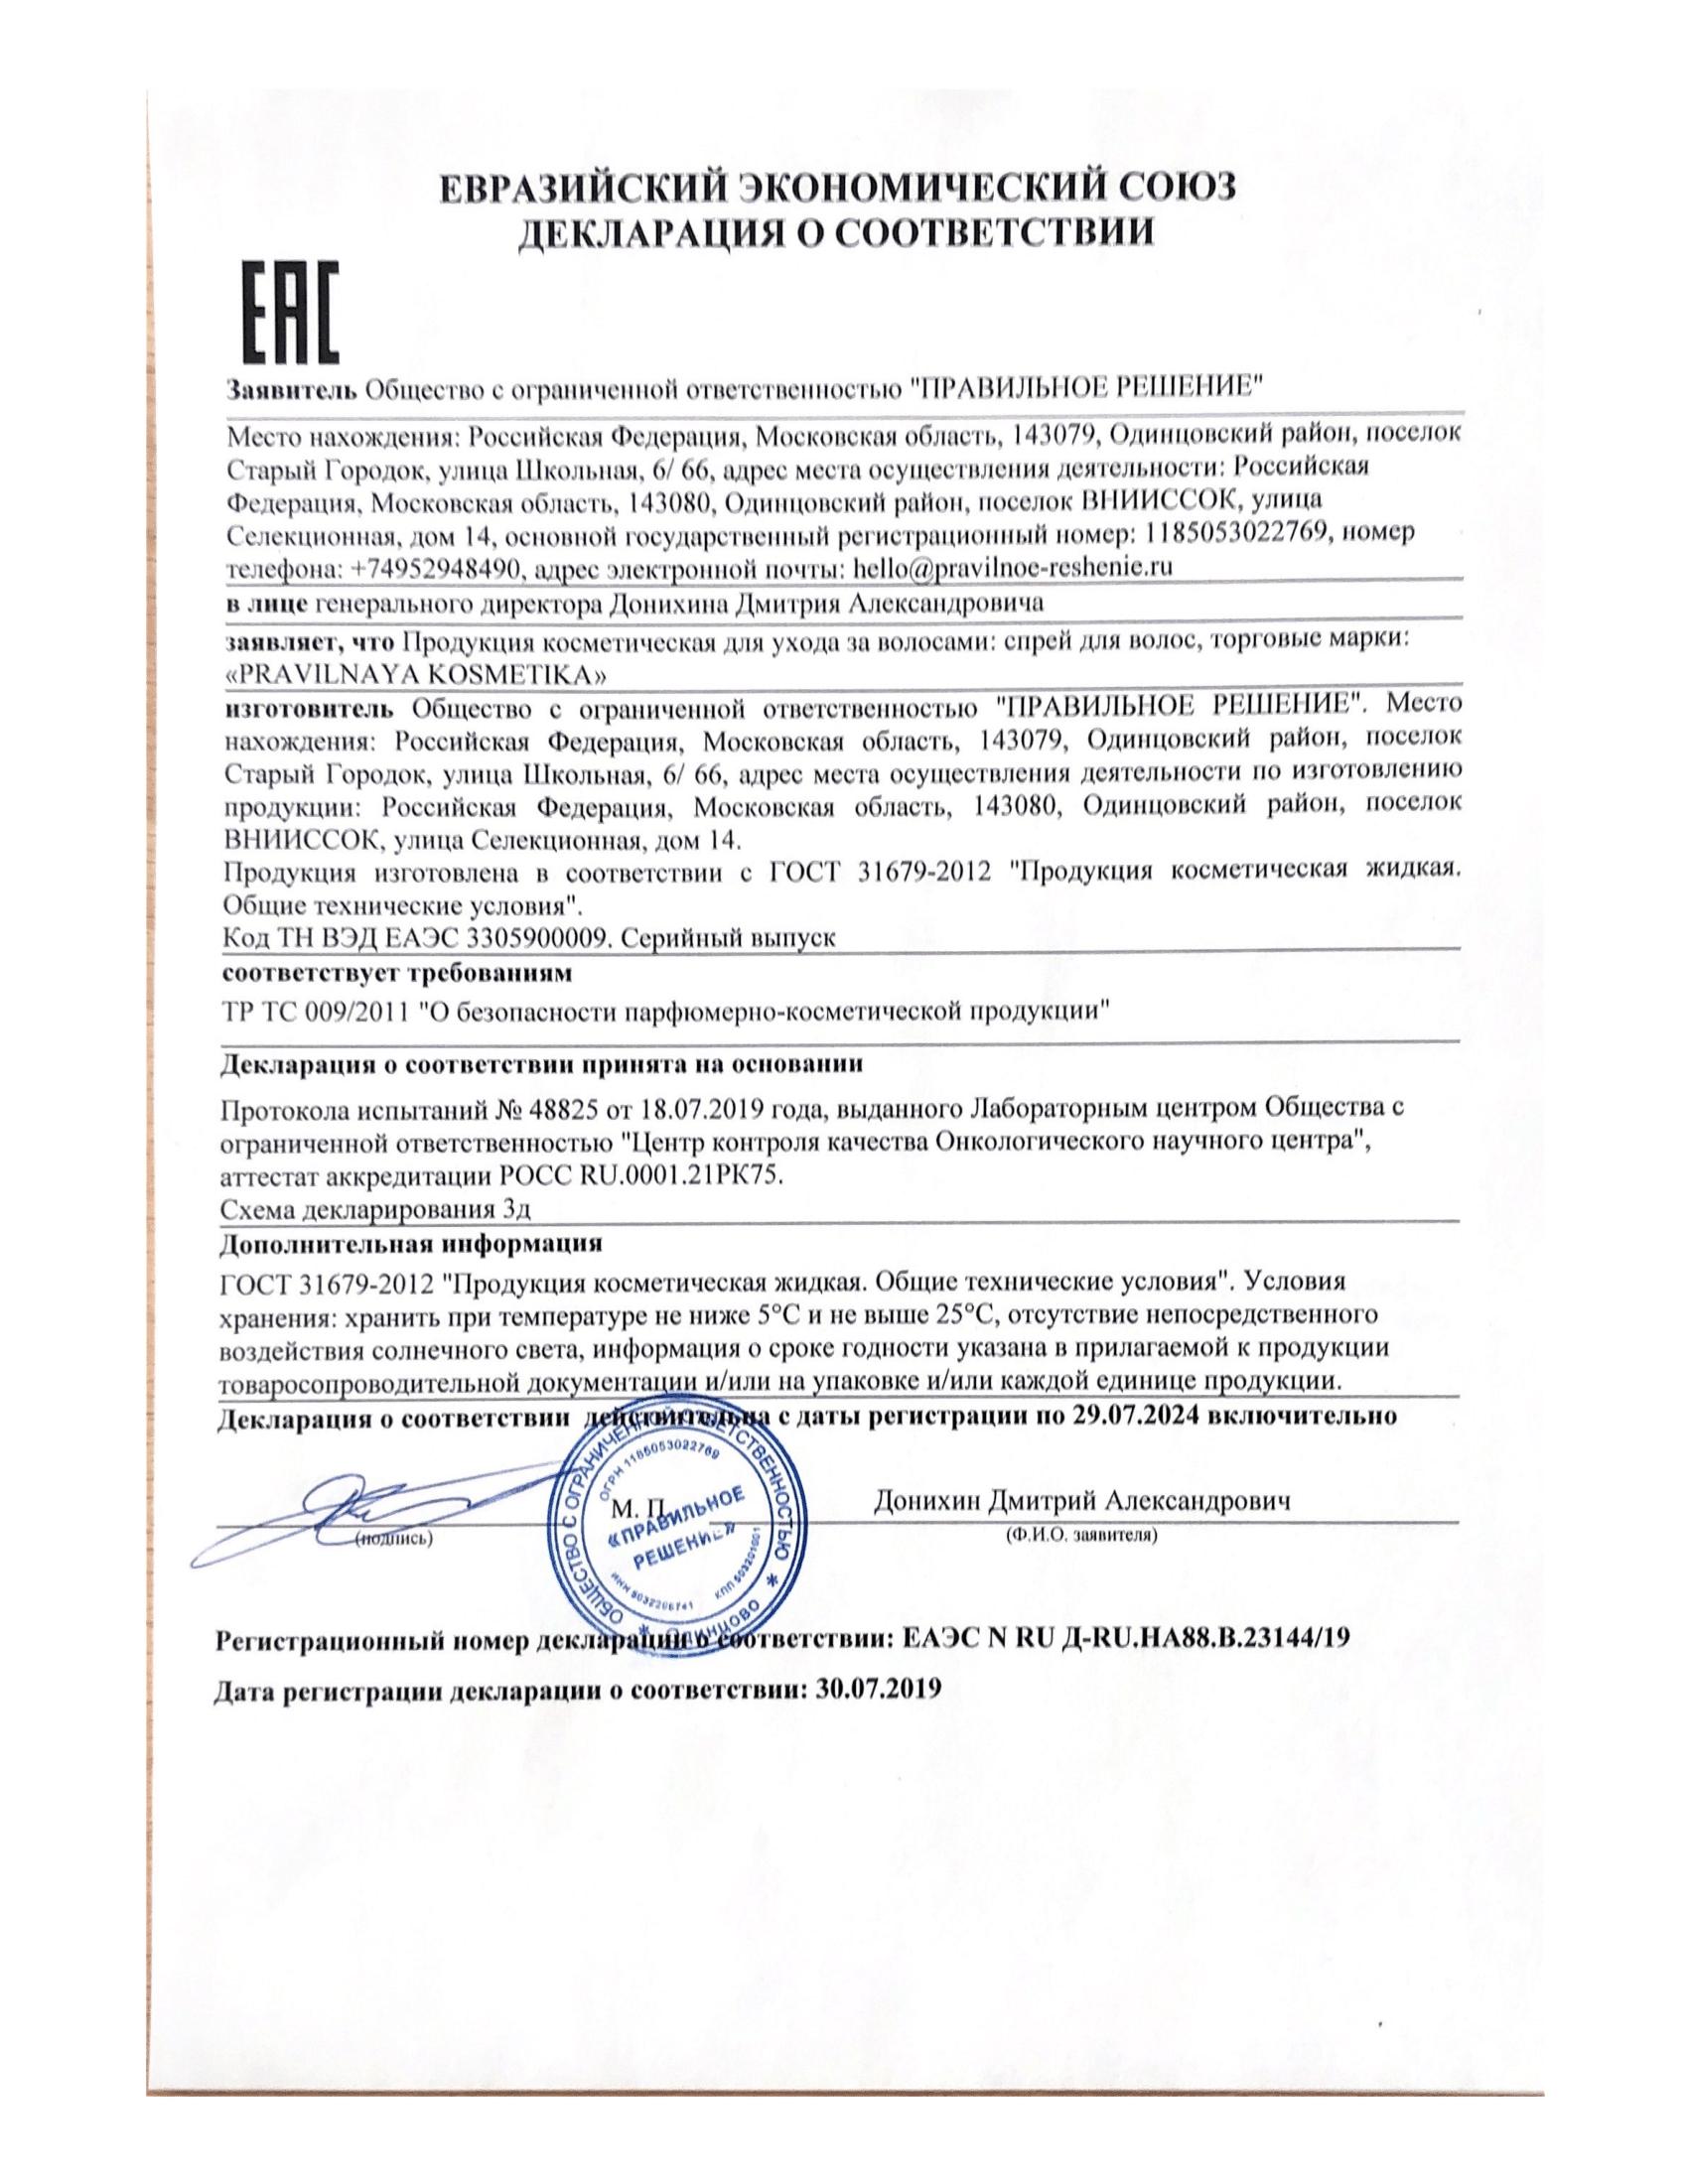 Сертификат на спреи для волос